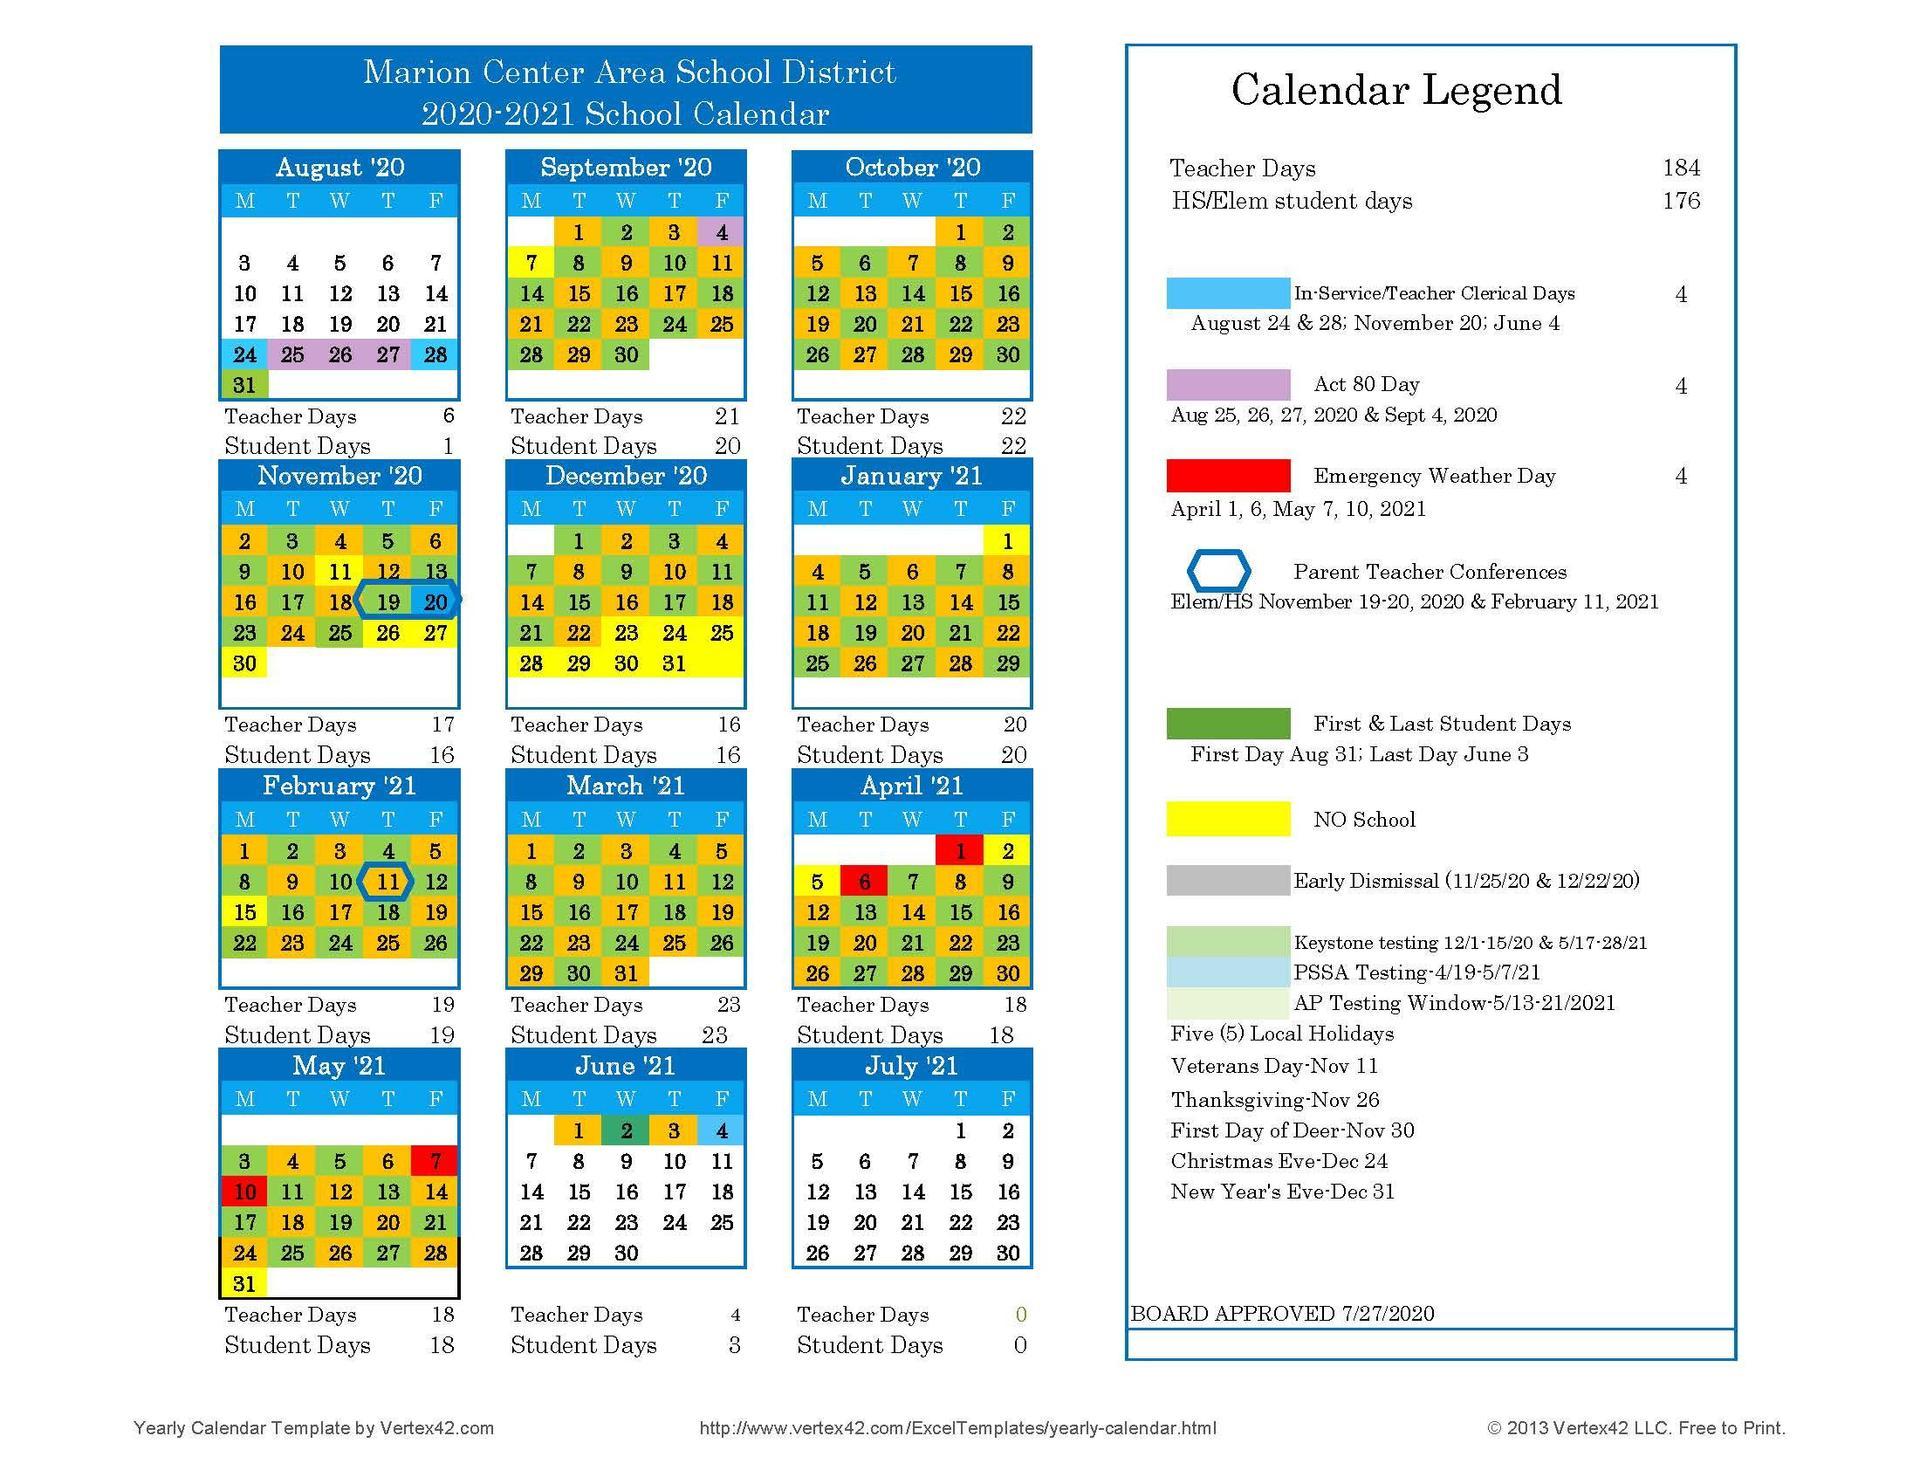 2020-21 Approved School Calendar